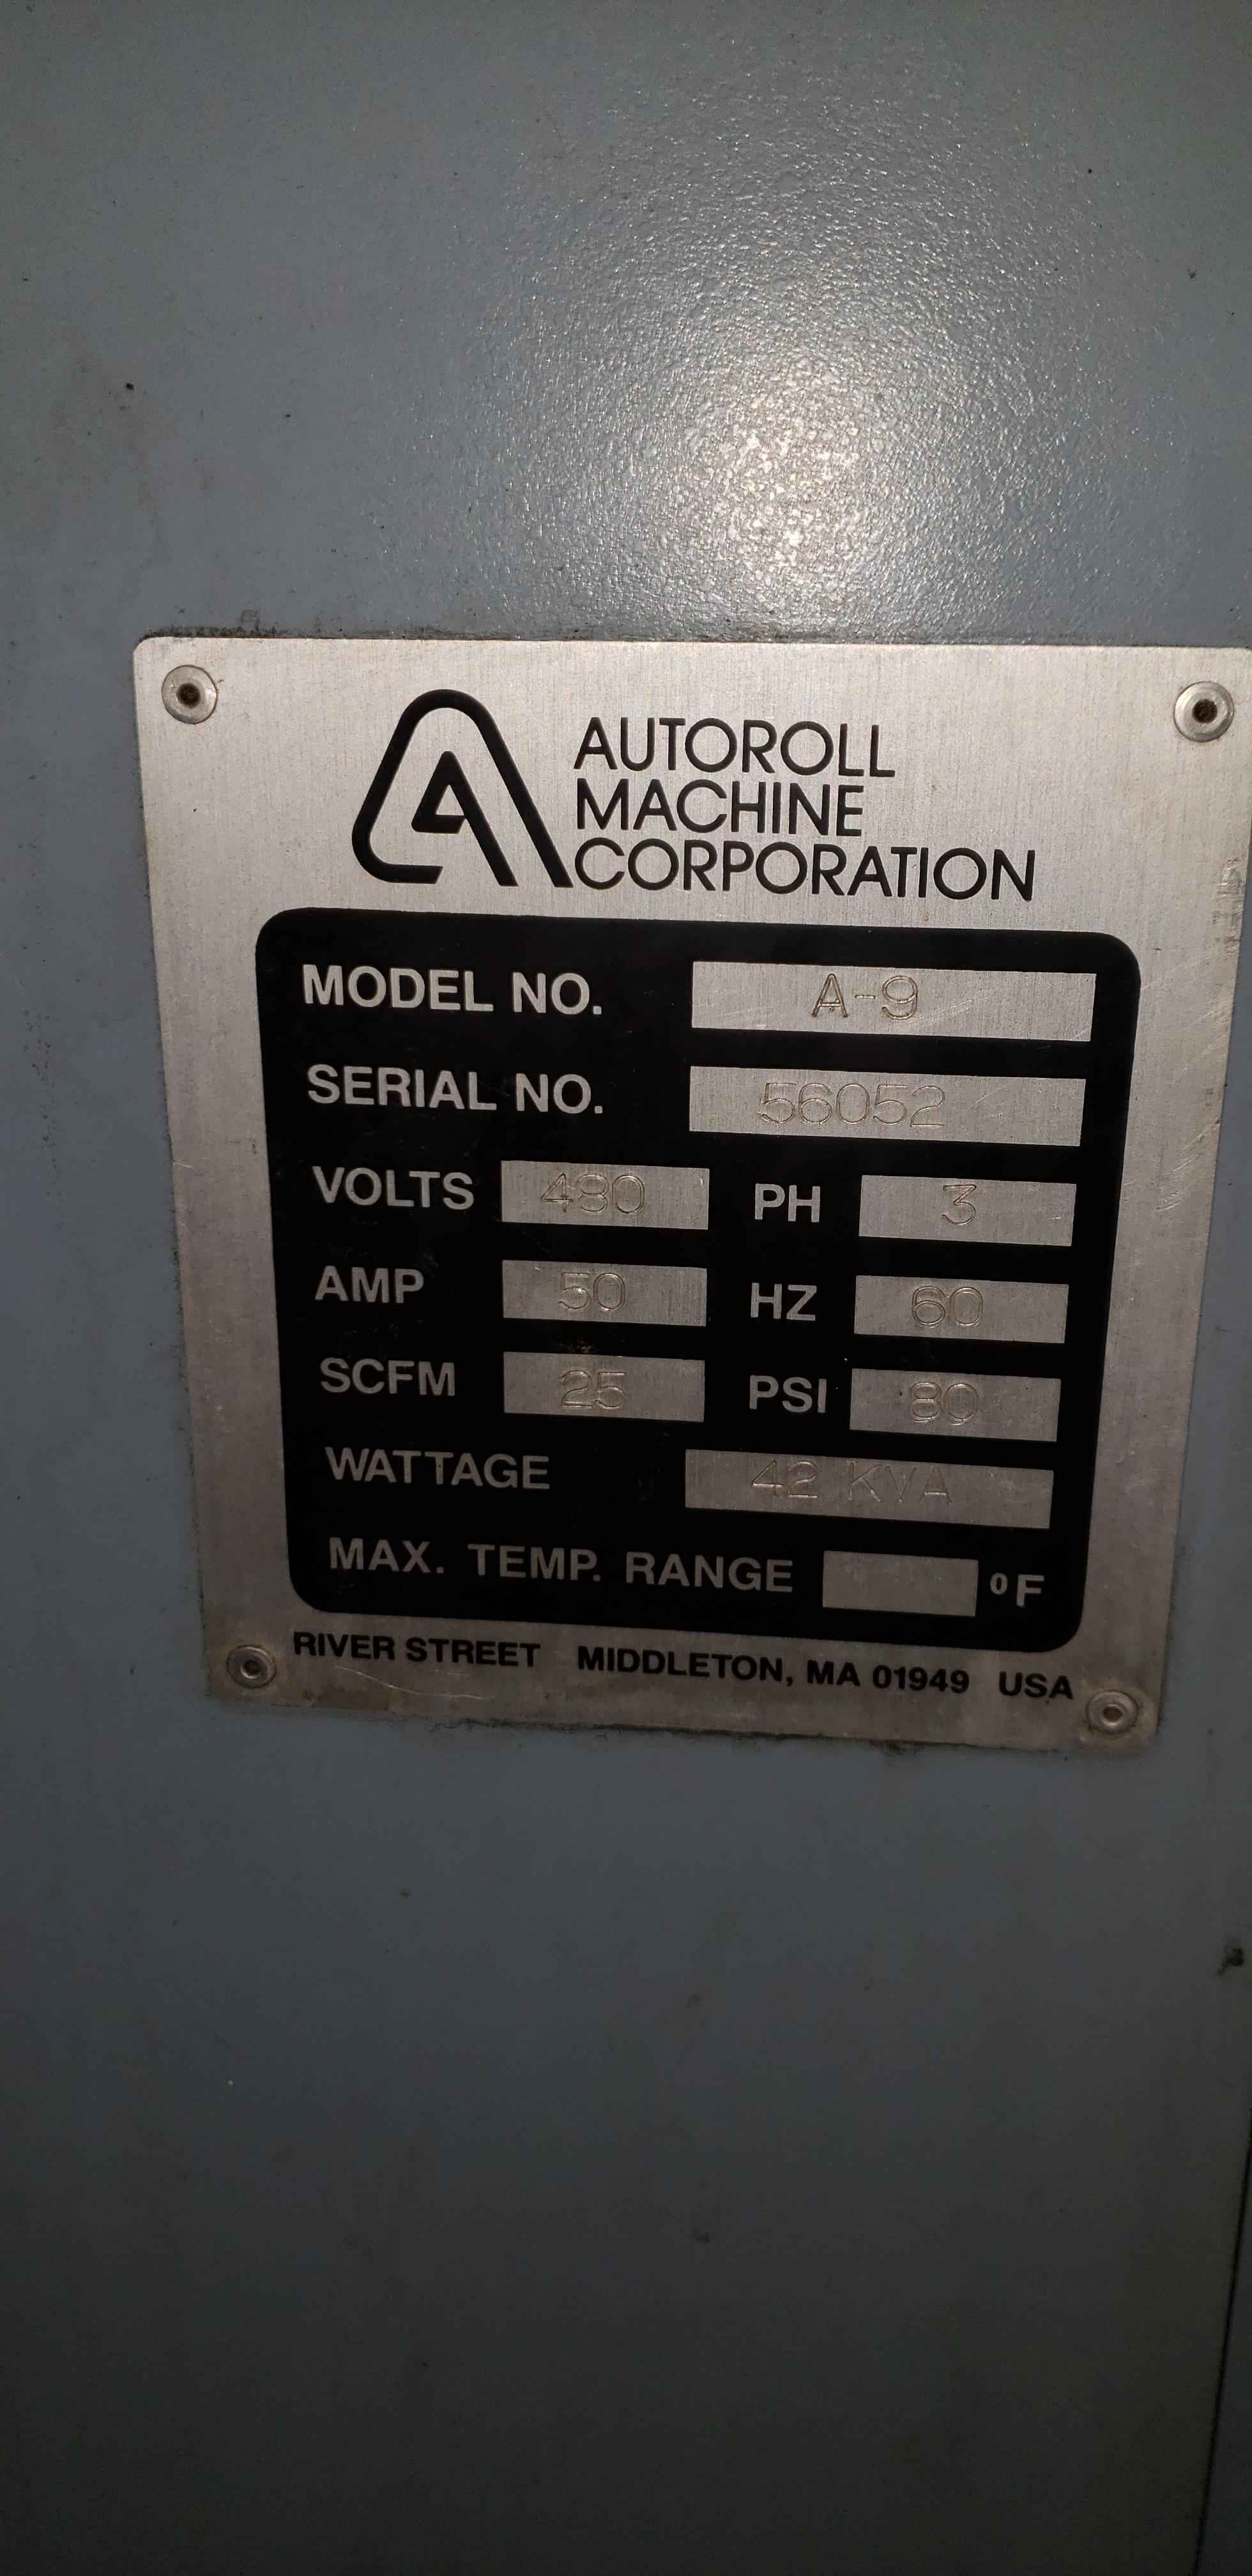 AutoRoll Model A9 /1- Color, Automatic, UV, Bottle Printer - Image 23 of 25